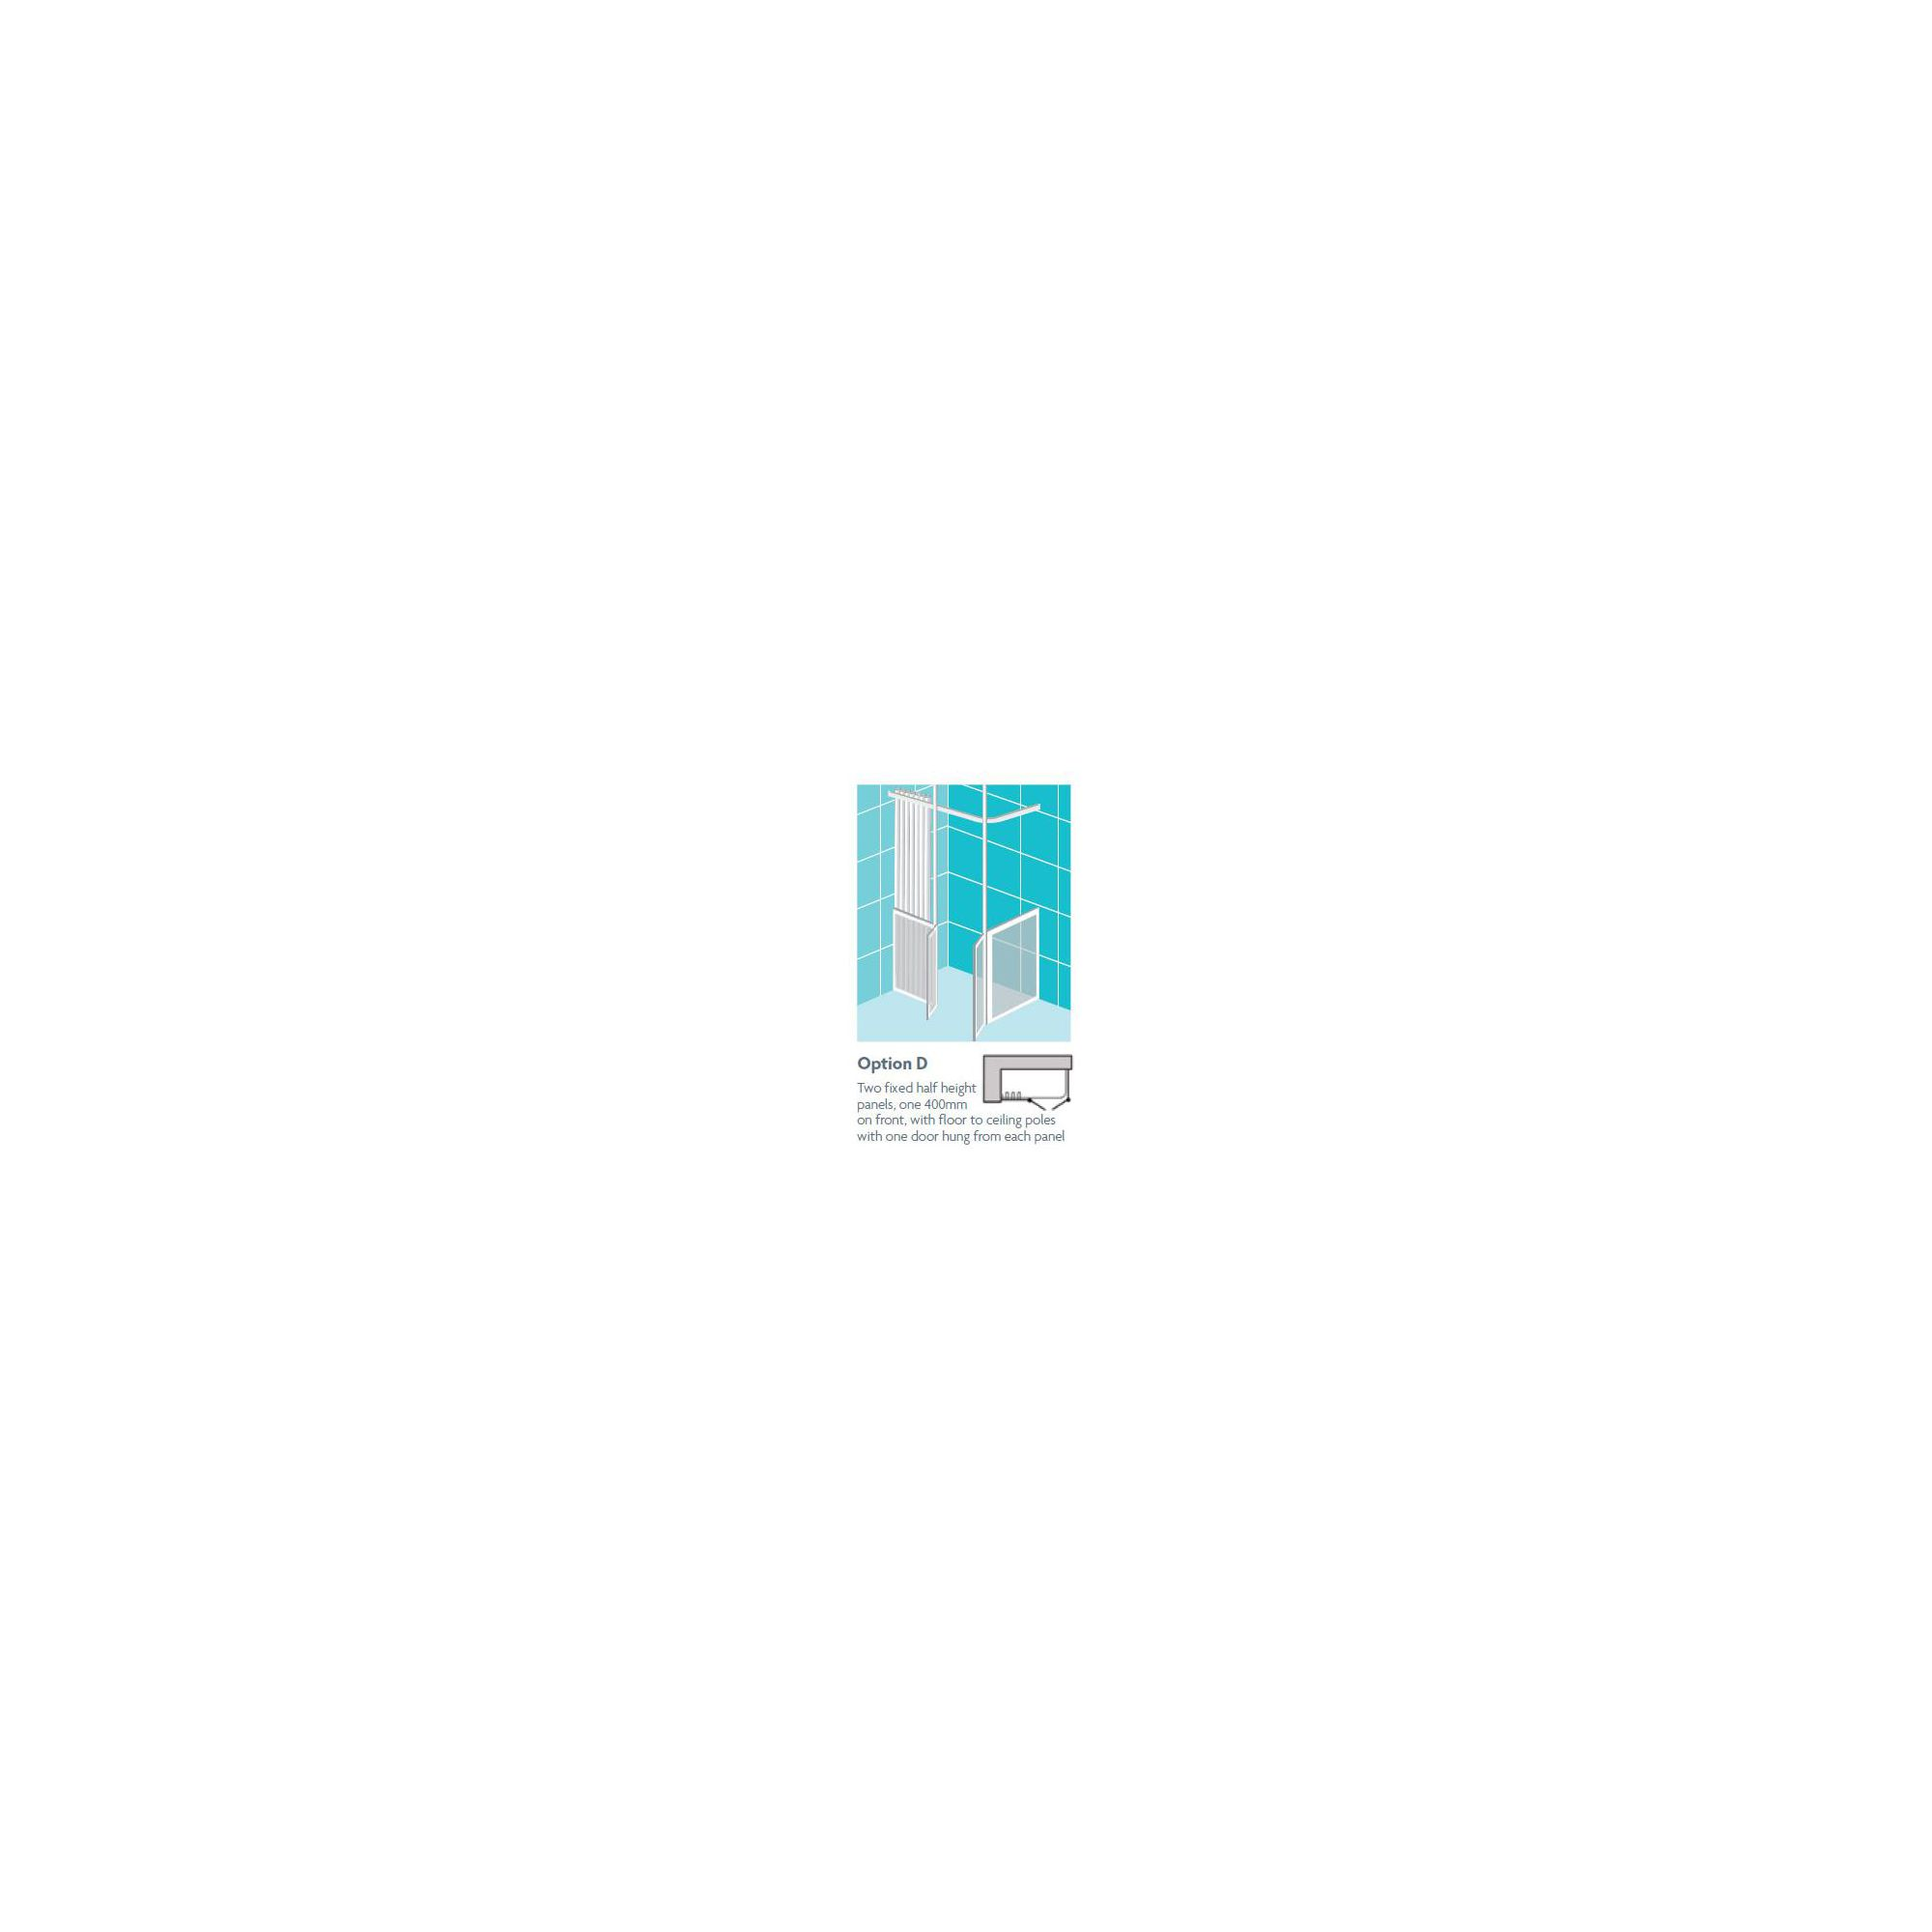 Impey Supreme Corner Door Option D Left Hand 1200mm x 900mm at Tesco Direct